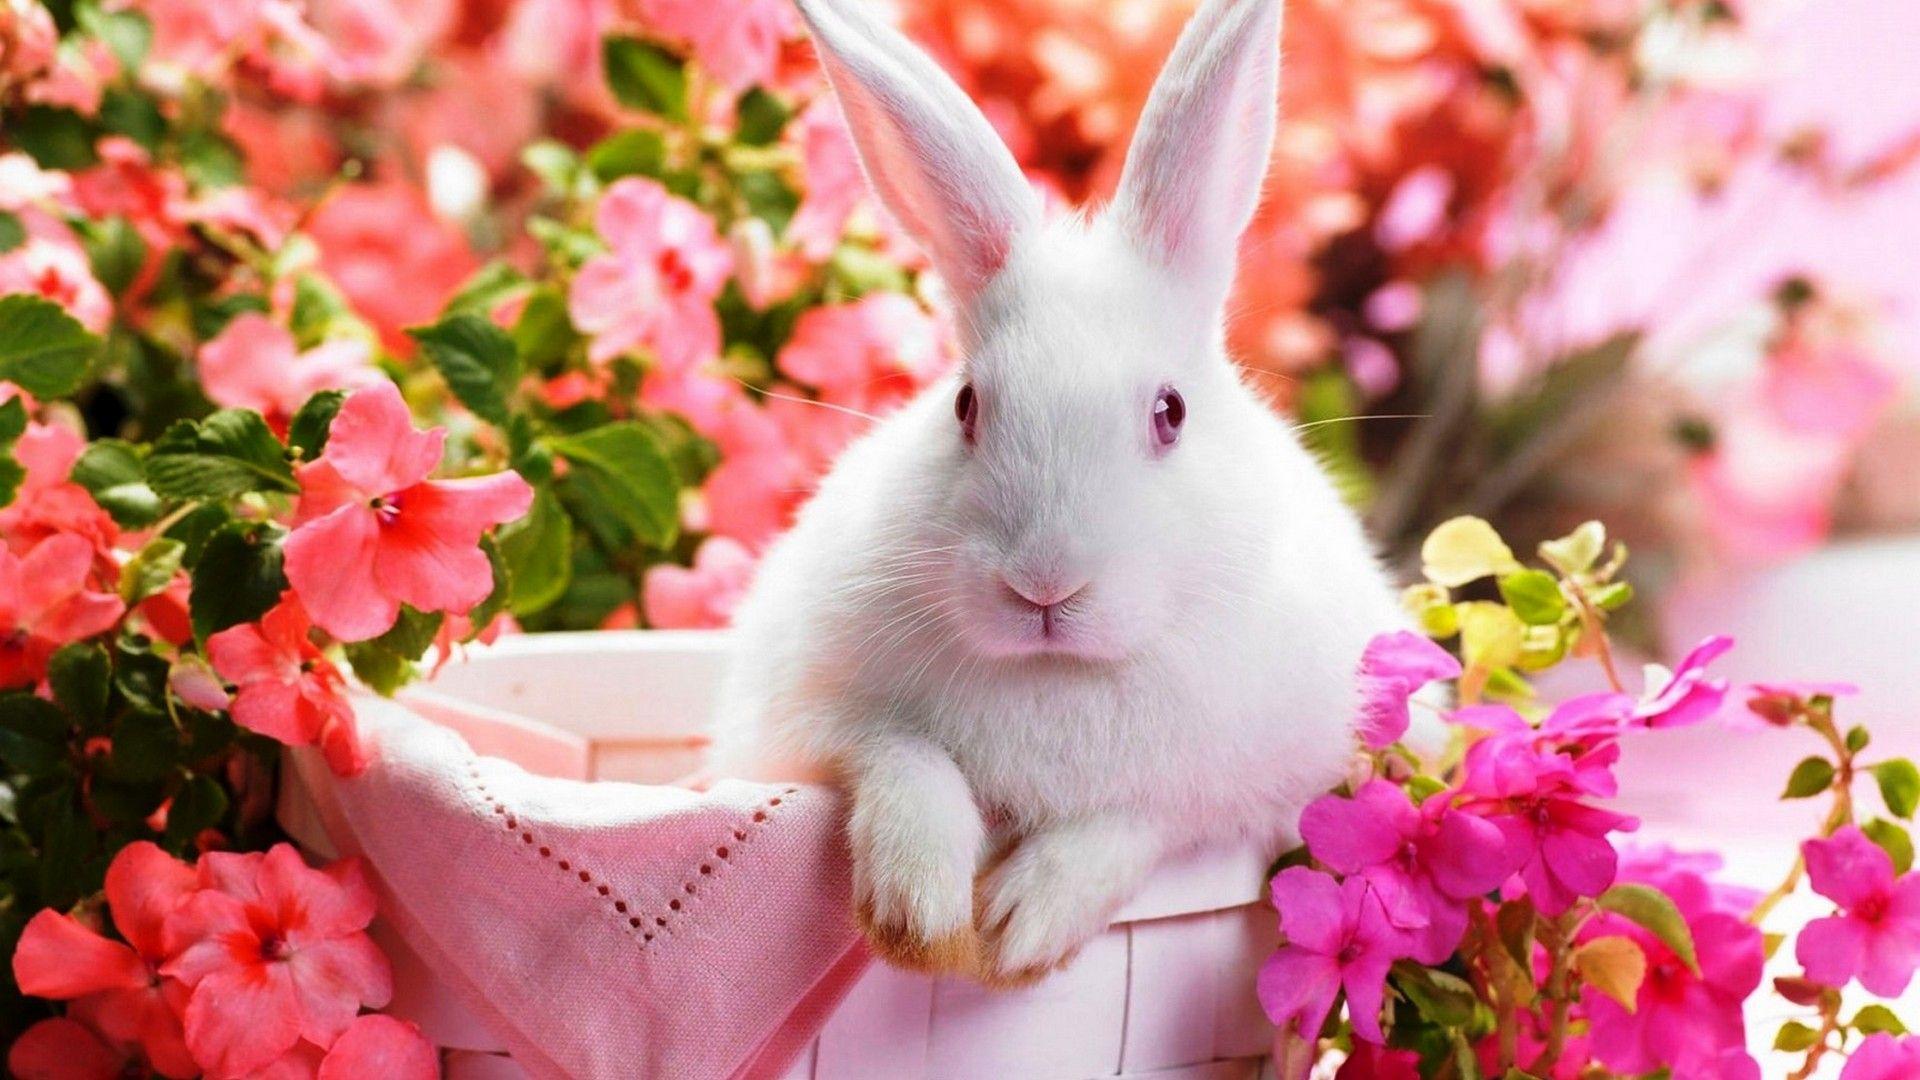 Cute Rabbit Wallpaper Hd Best Hd Wallpapers Easter Wallpaper Bunny Wallpaper Spring Bunny